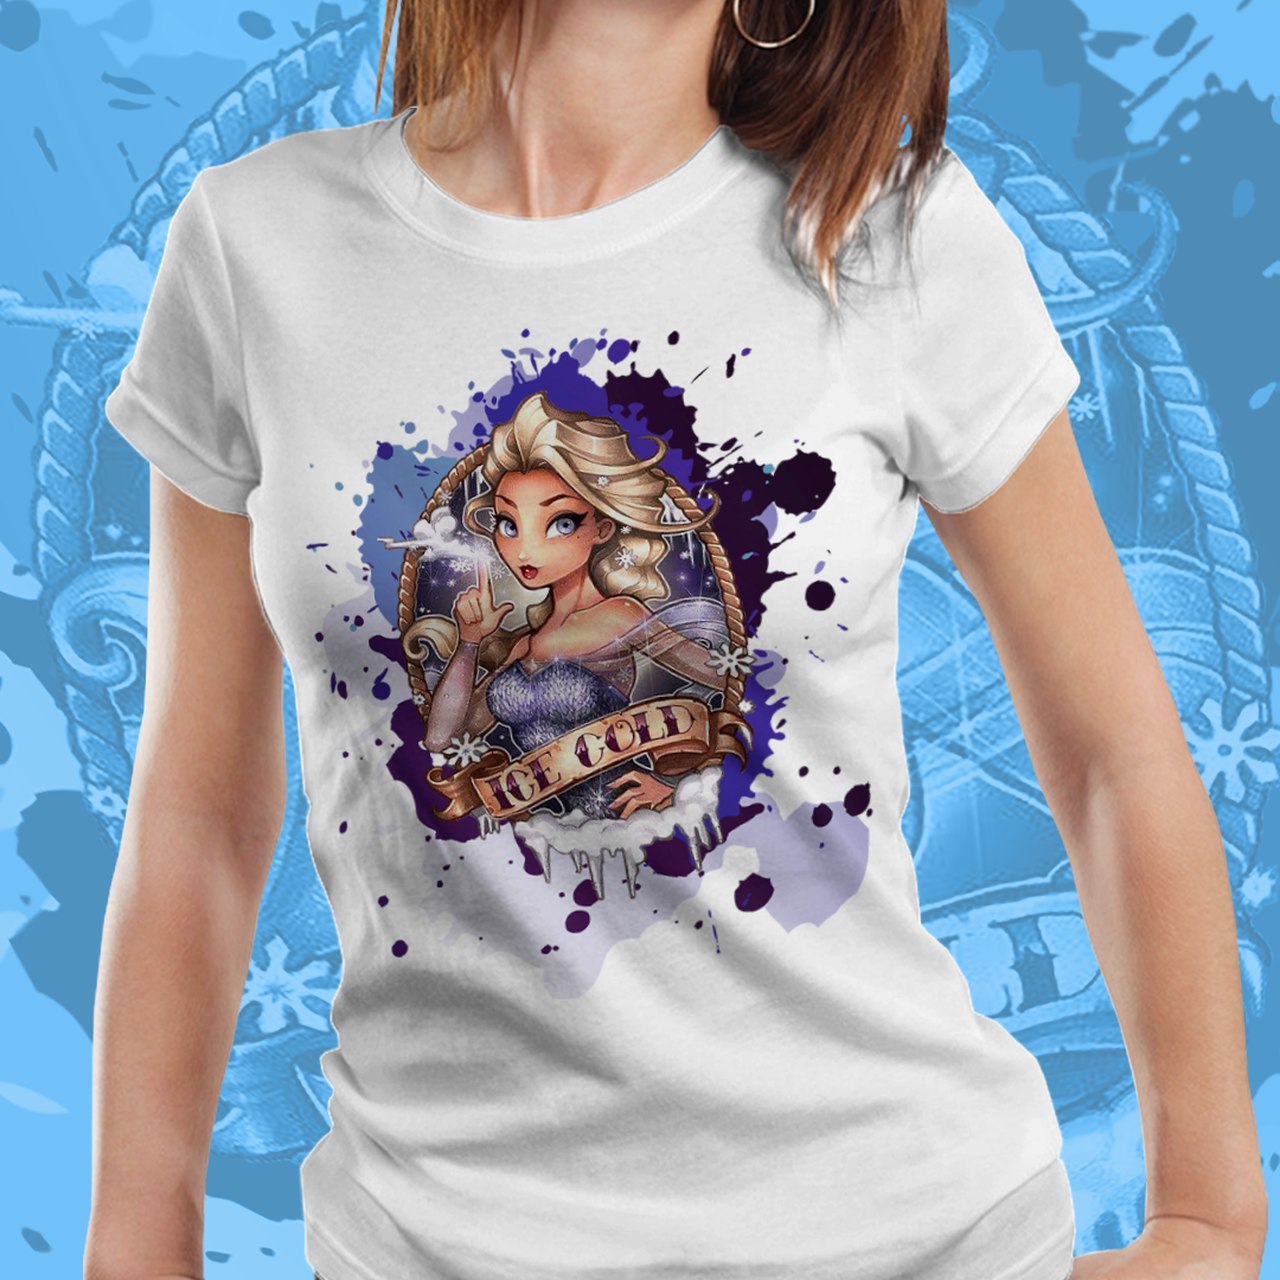 Camiseta Feminina Princesa Elsa: Frozen - Disney (Branco) - EV